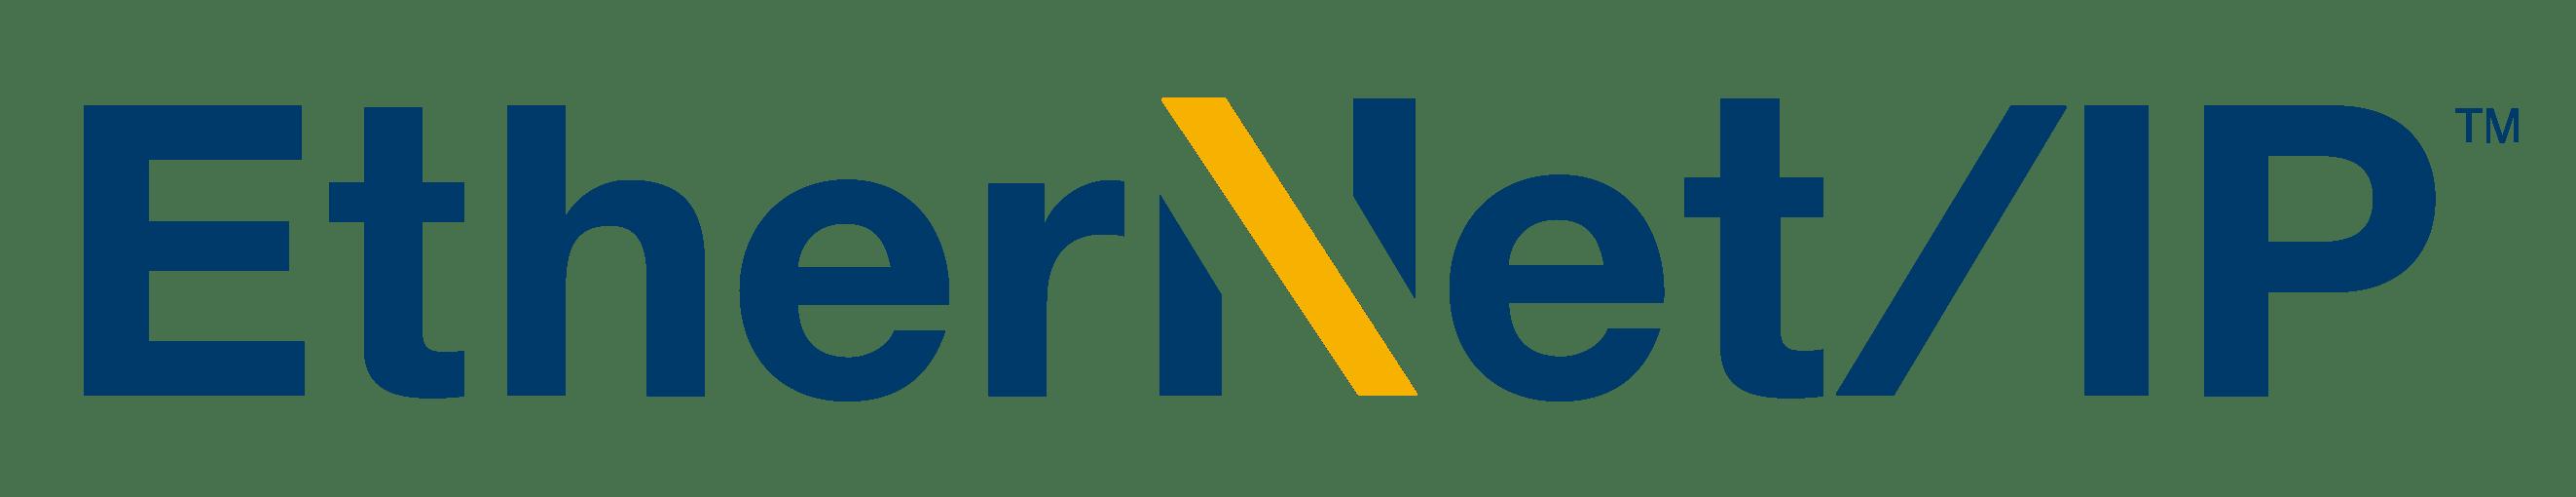 EtherNet/IP Embedded Development Services